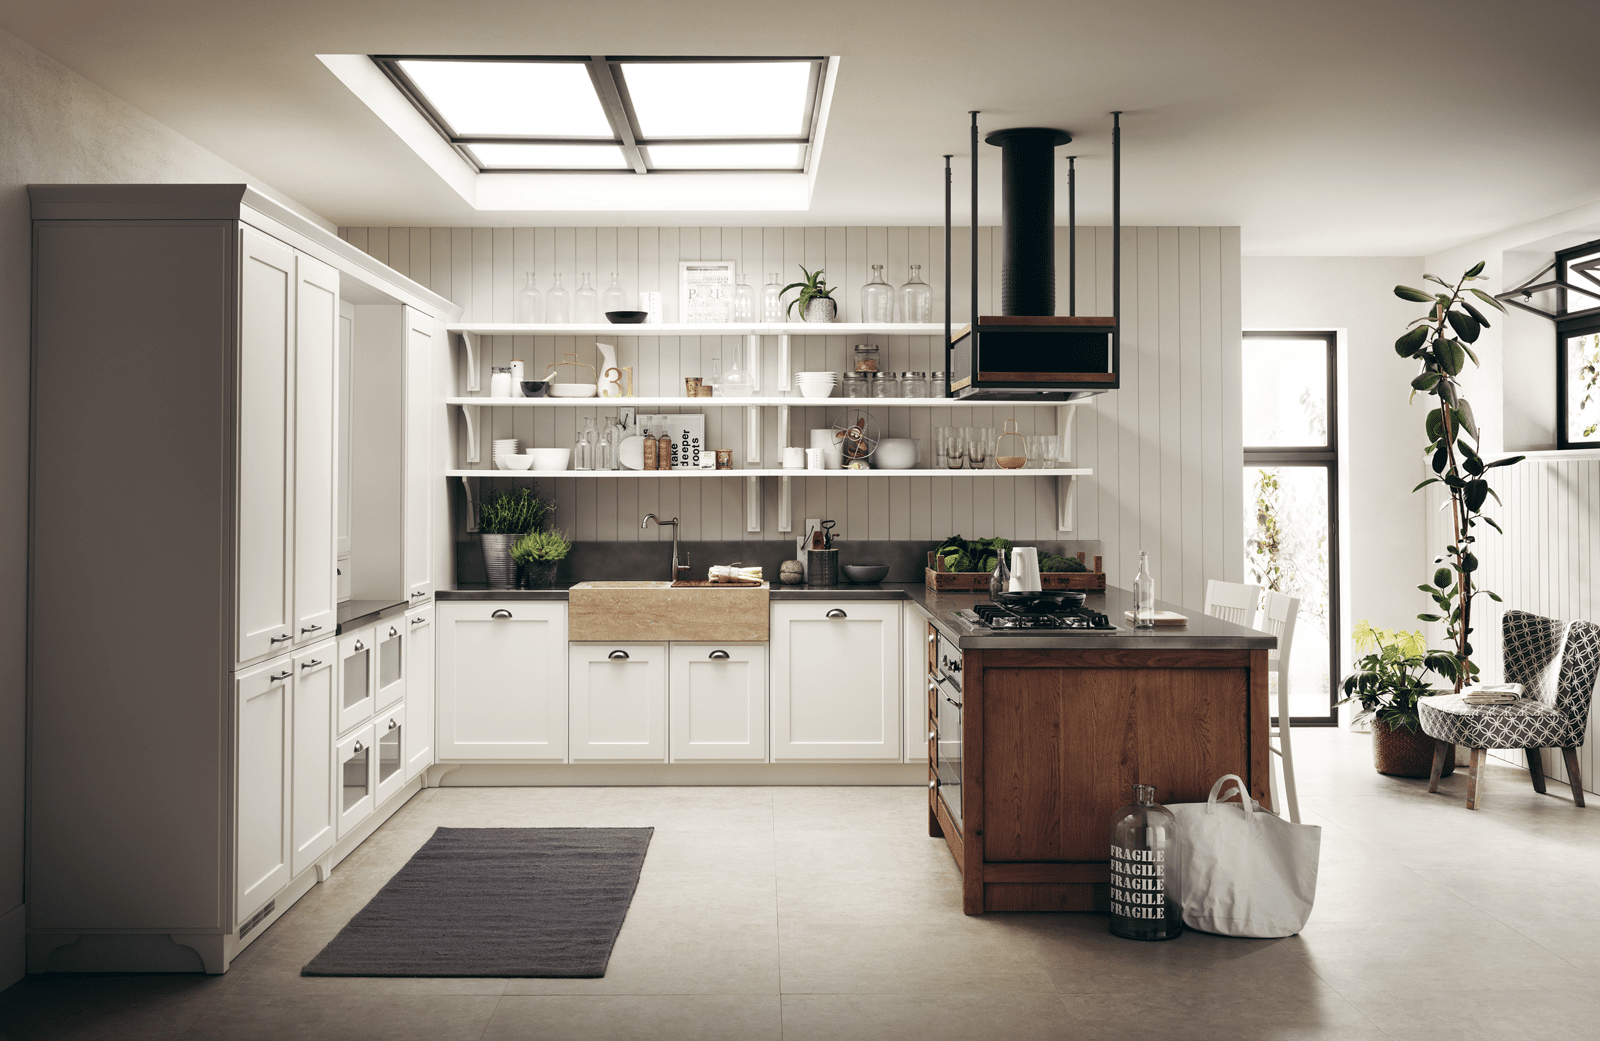 Beautiful Cucina Stile Inglese Ideas - bakeroffroad.us ...